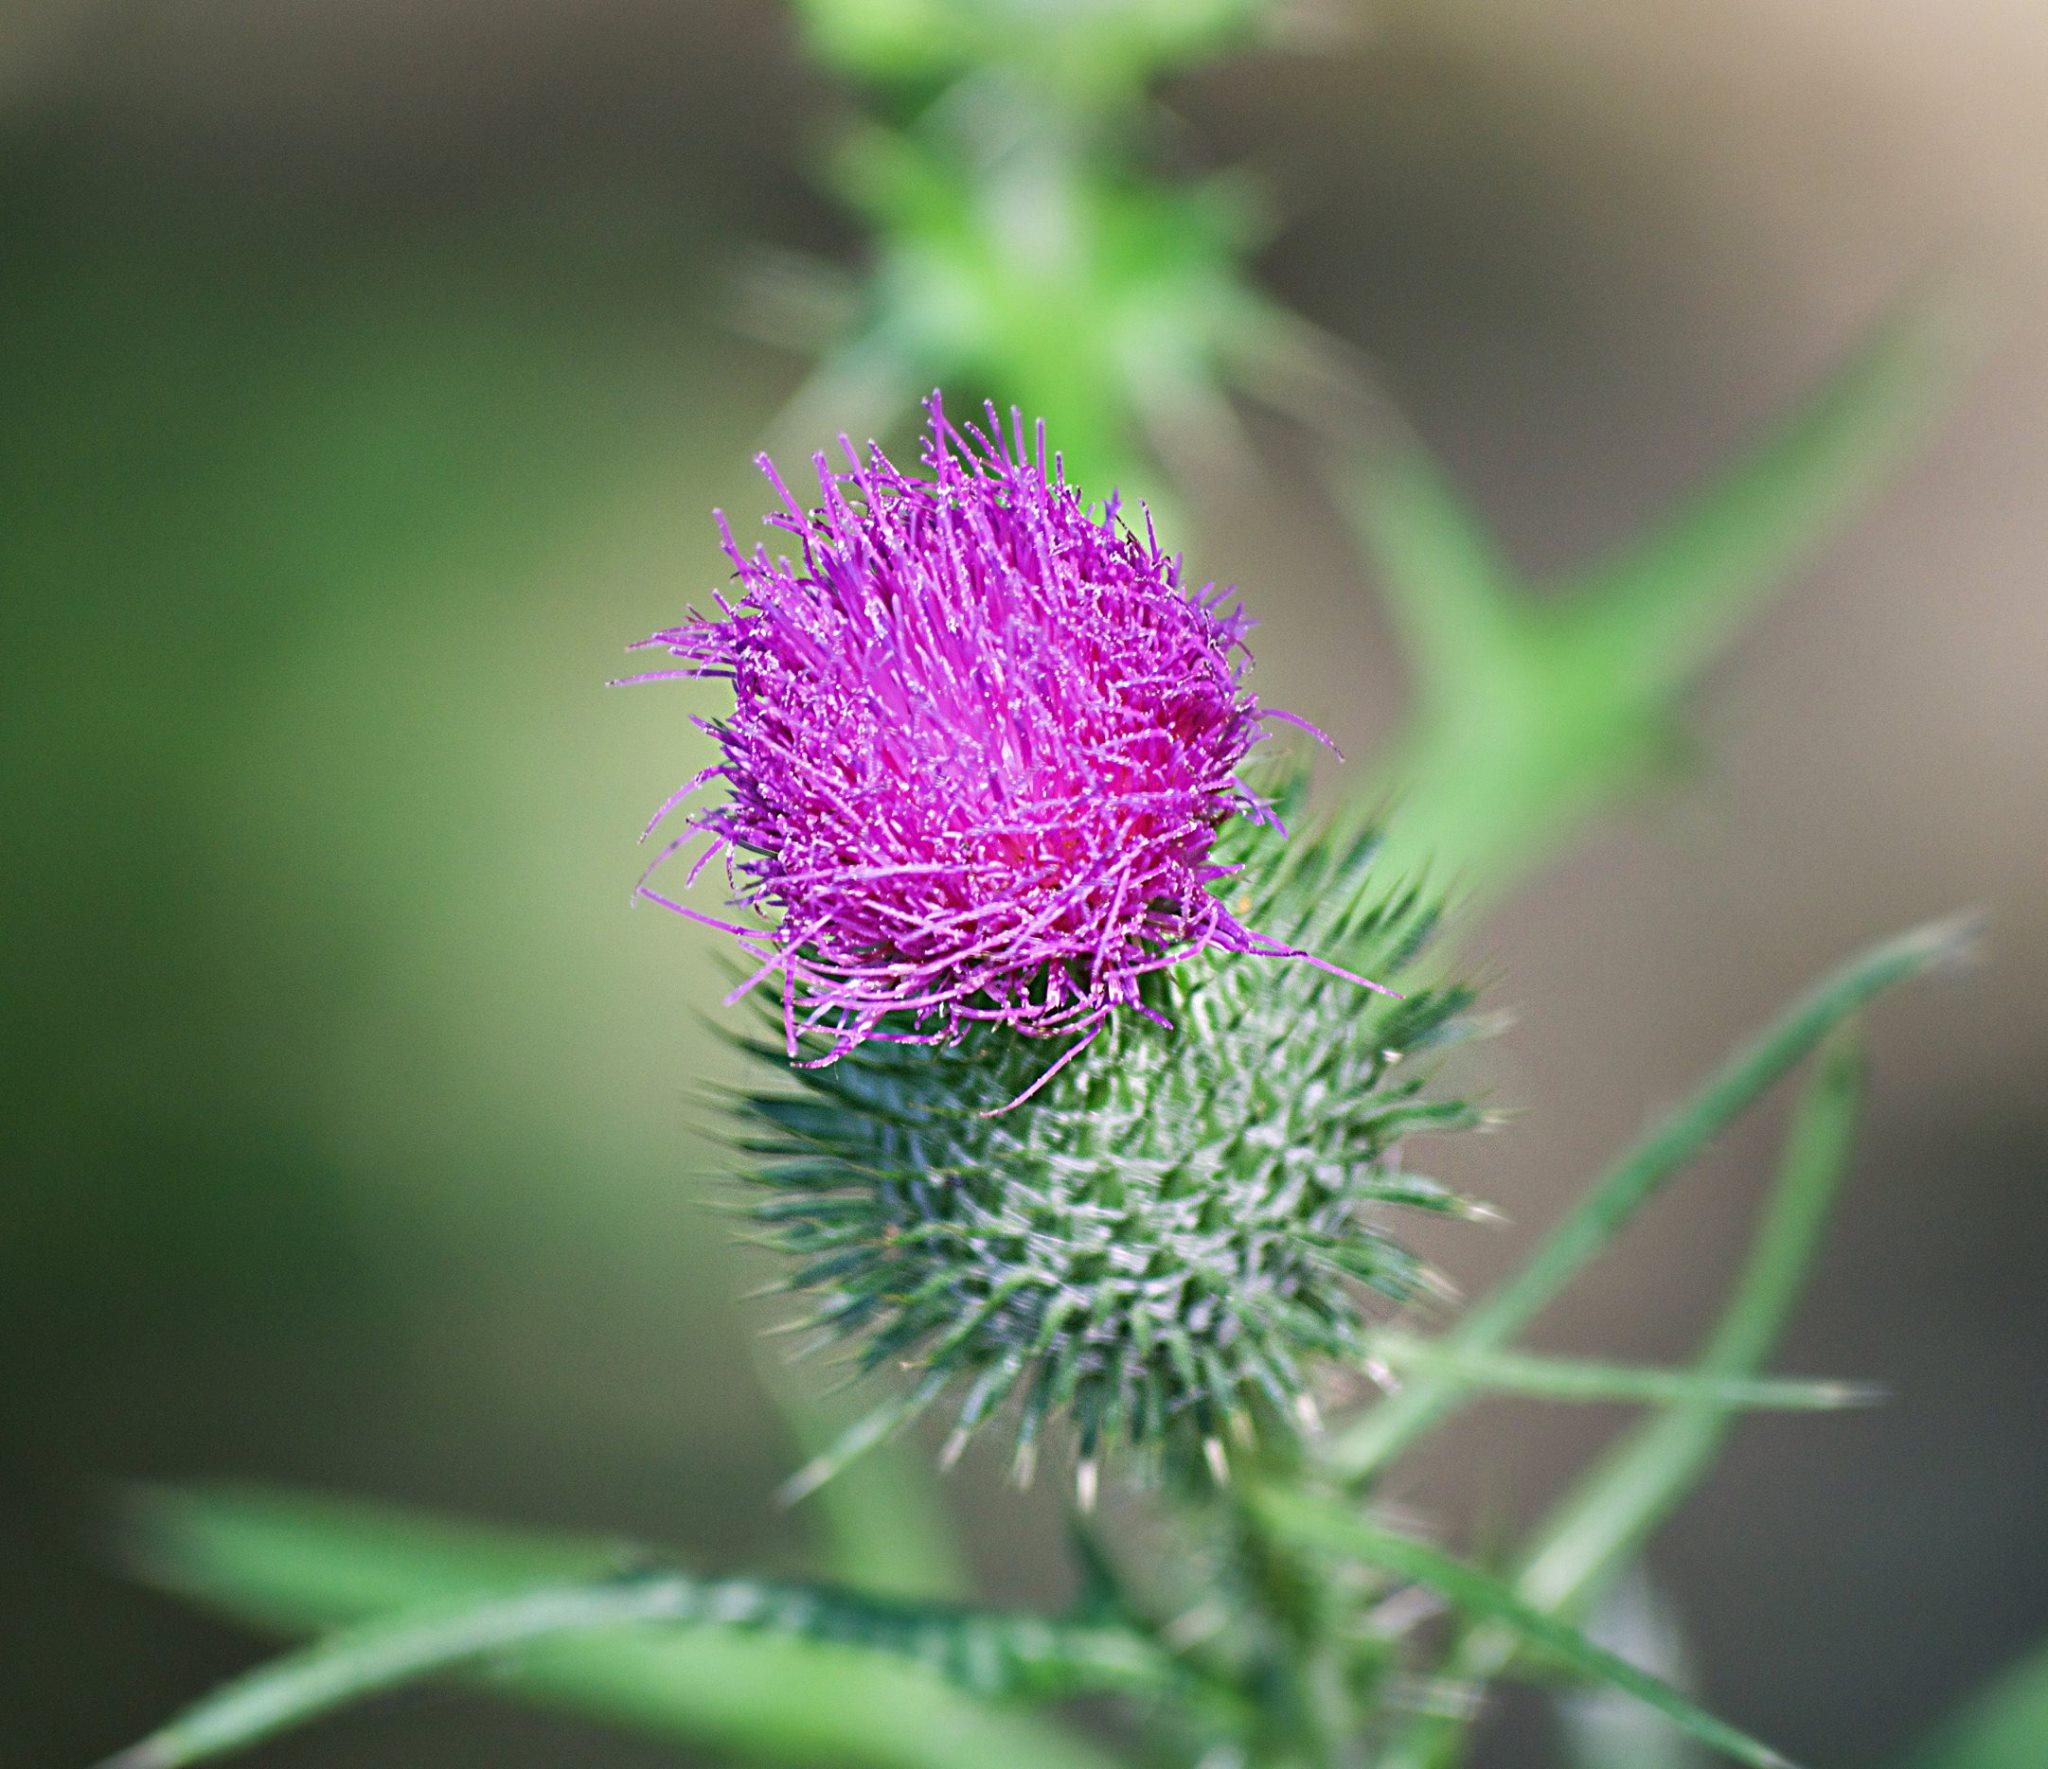 Of The Purple Fallow